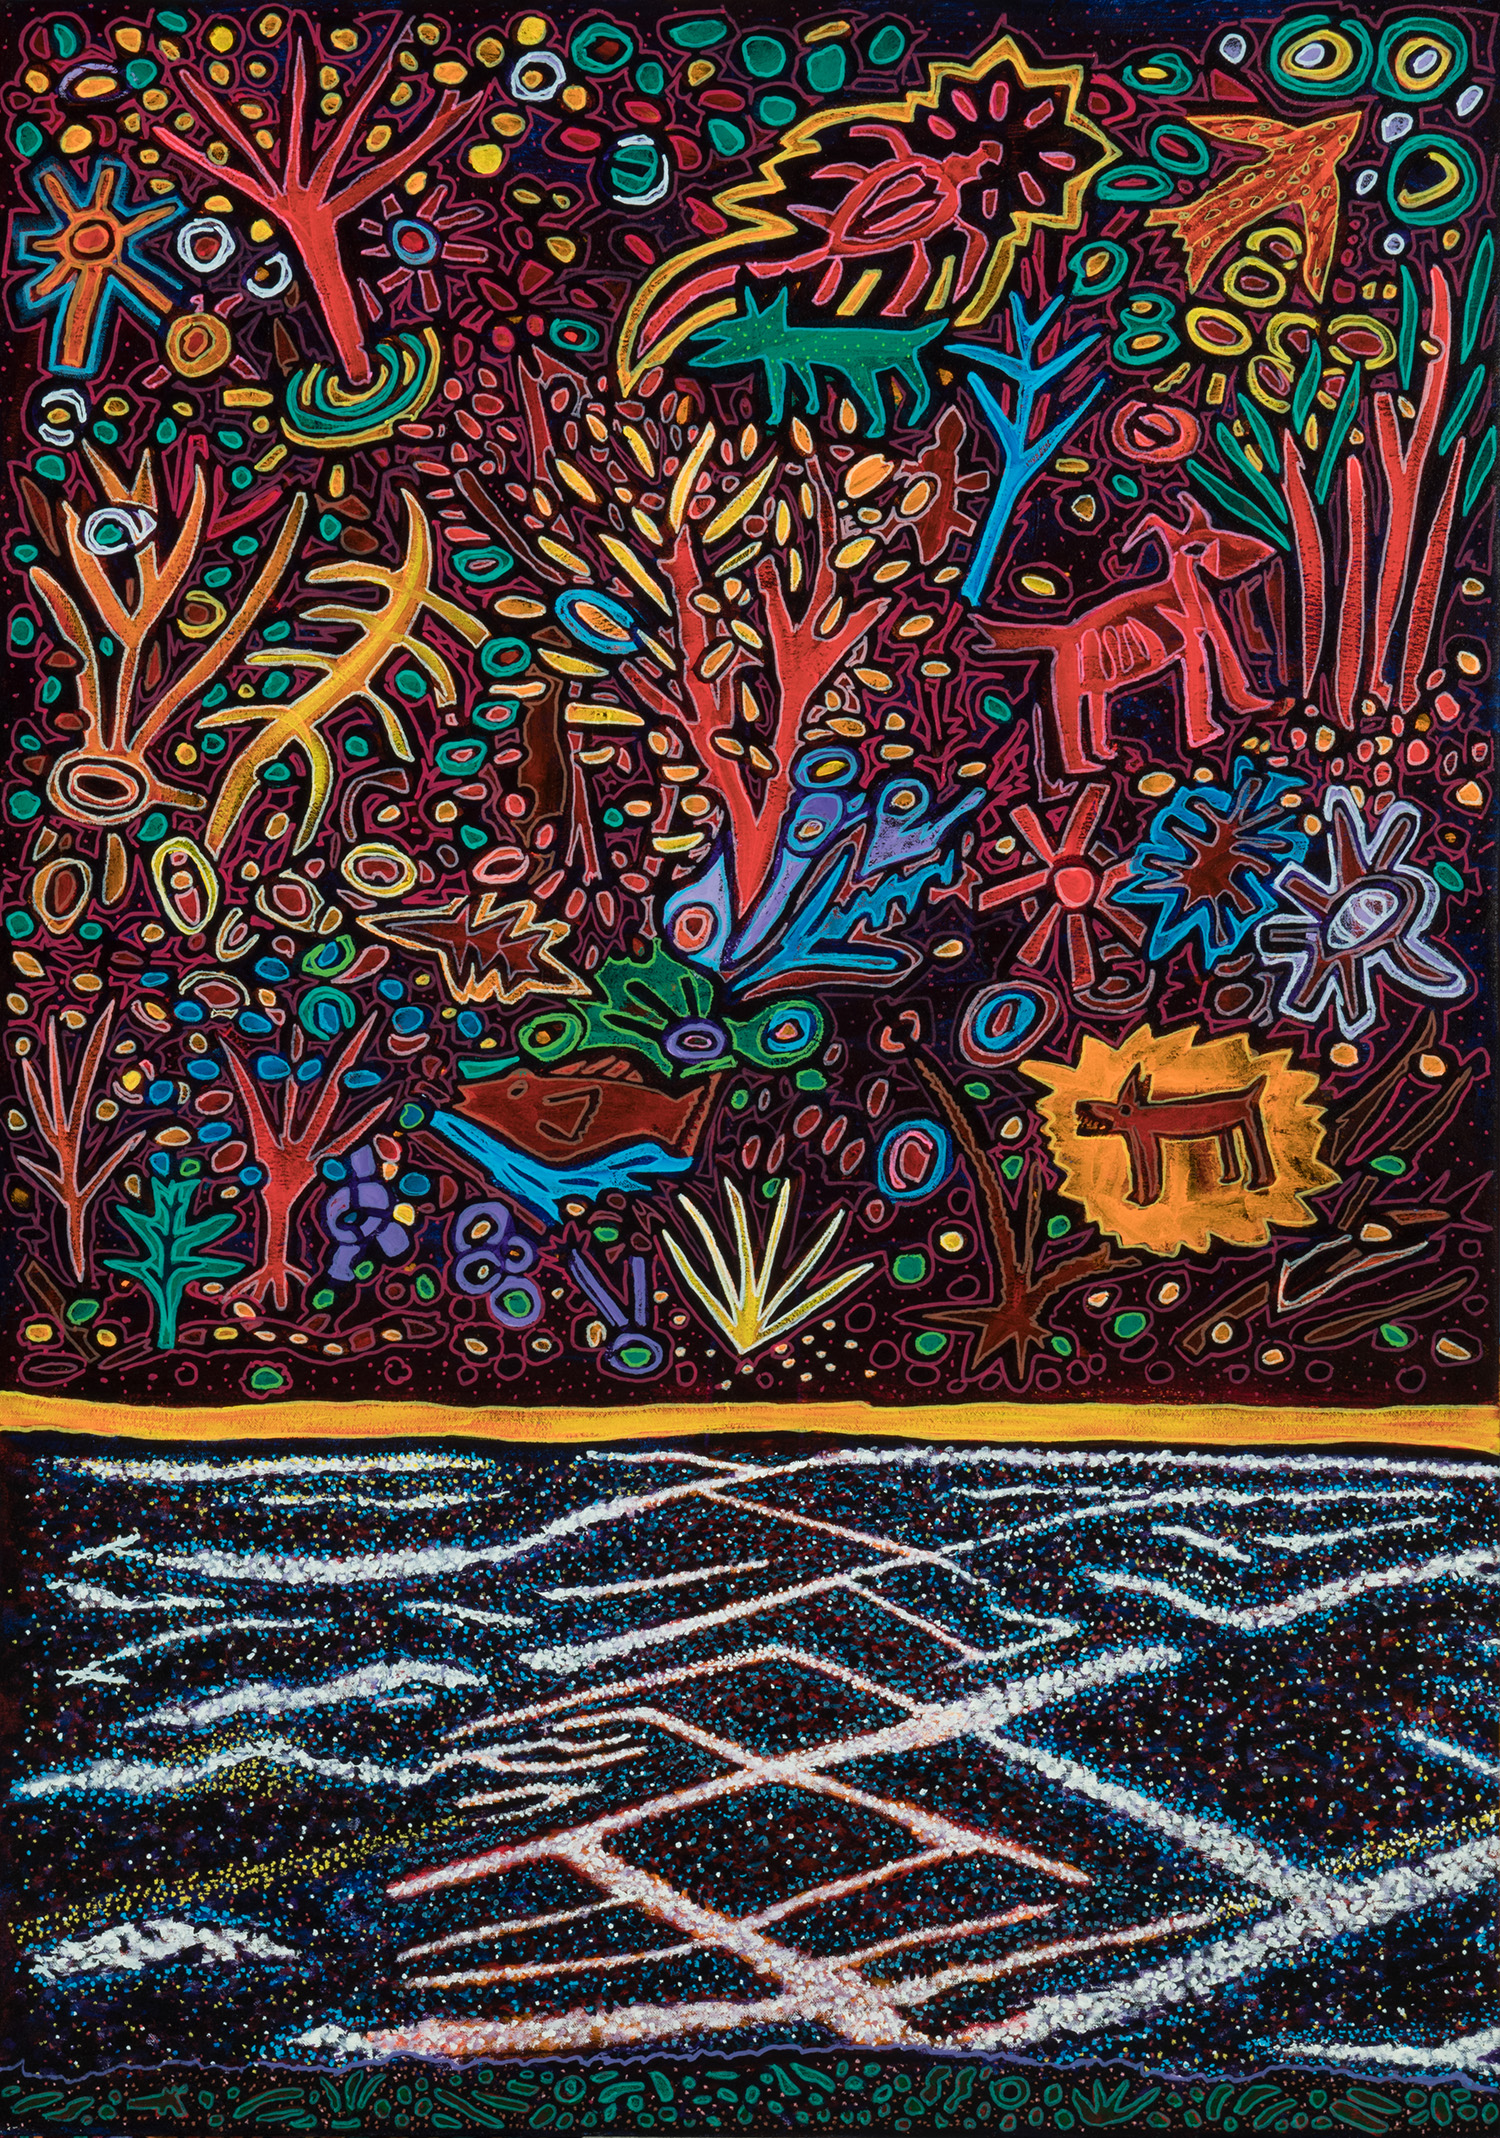 constellations, 2018, 28x40